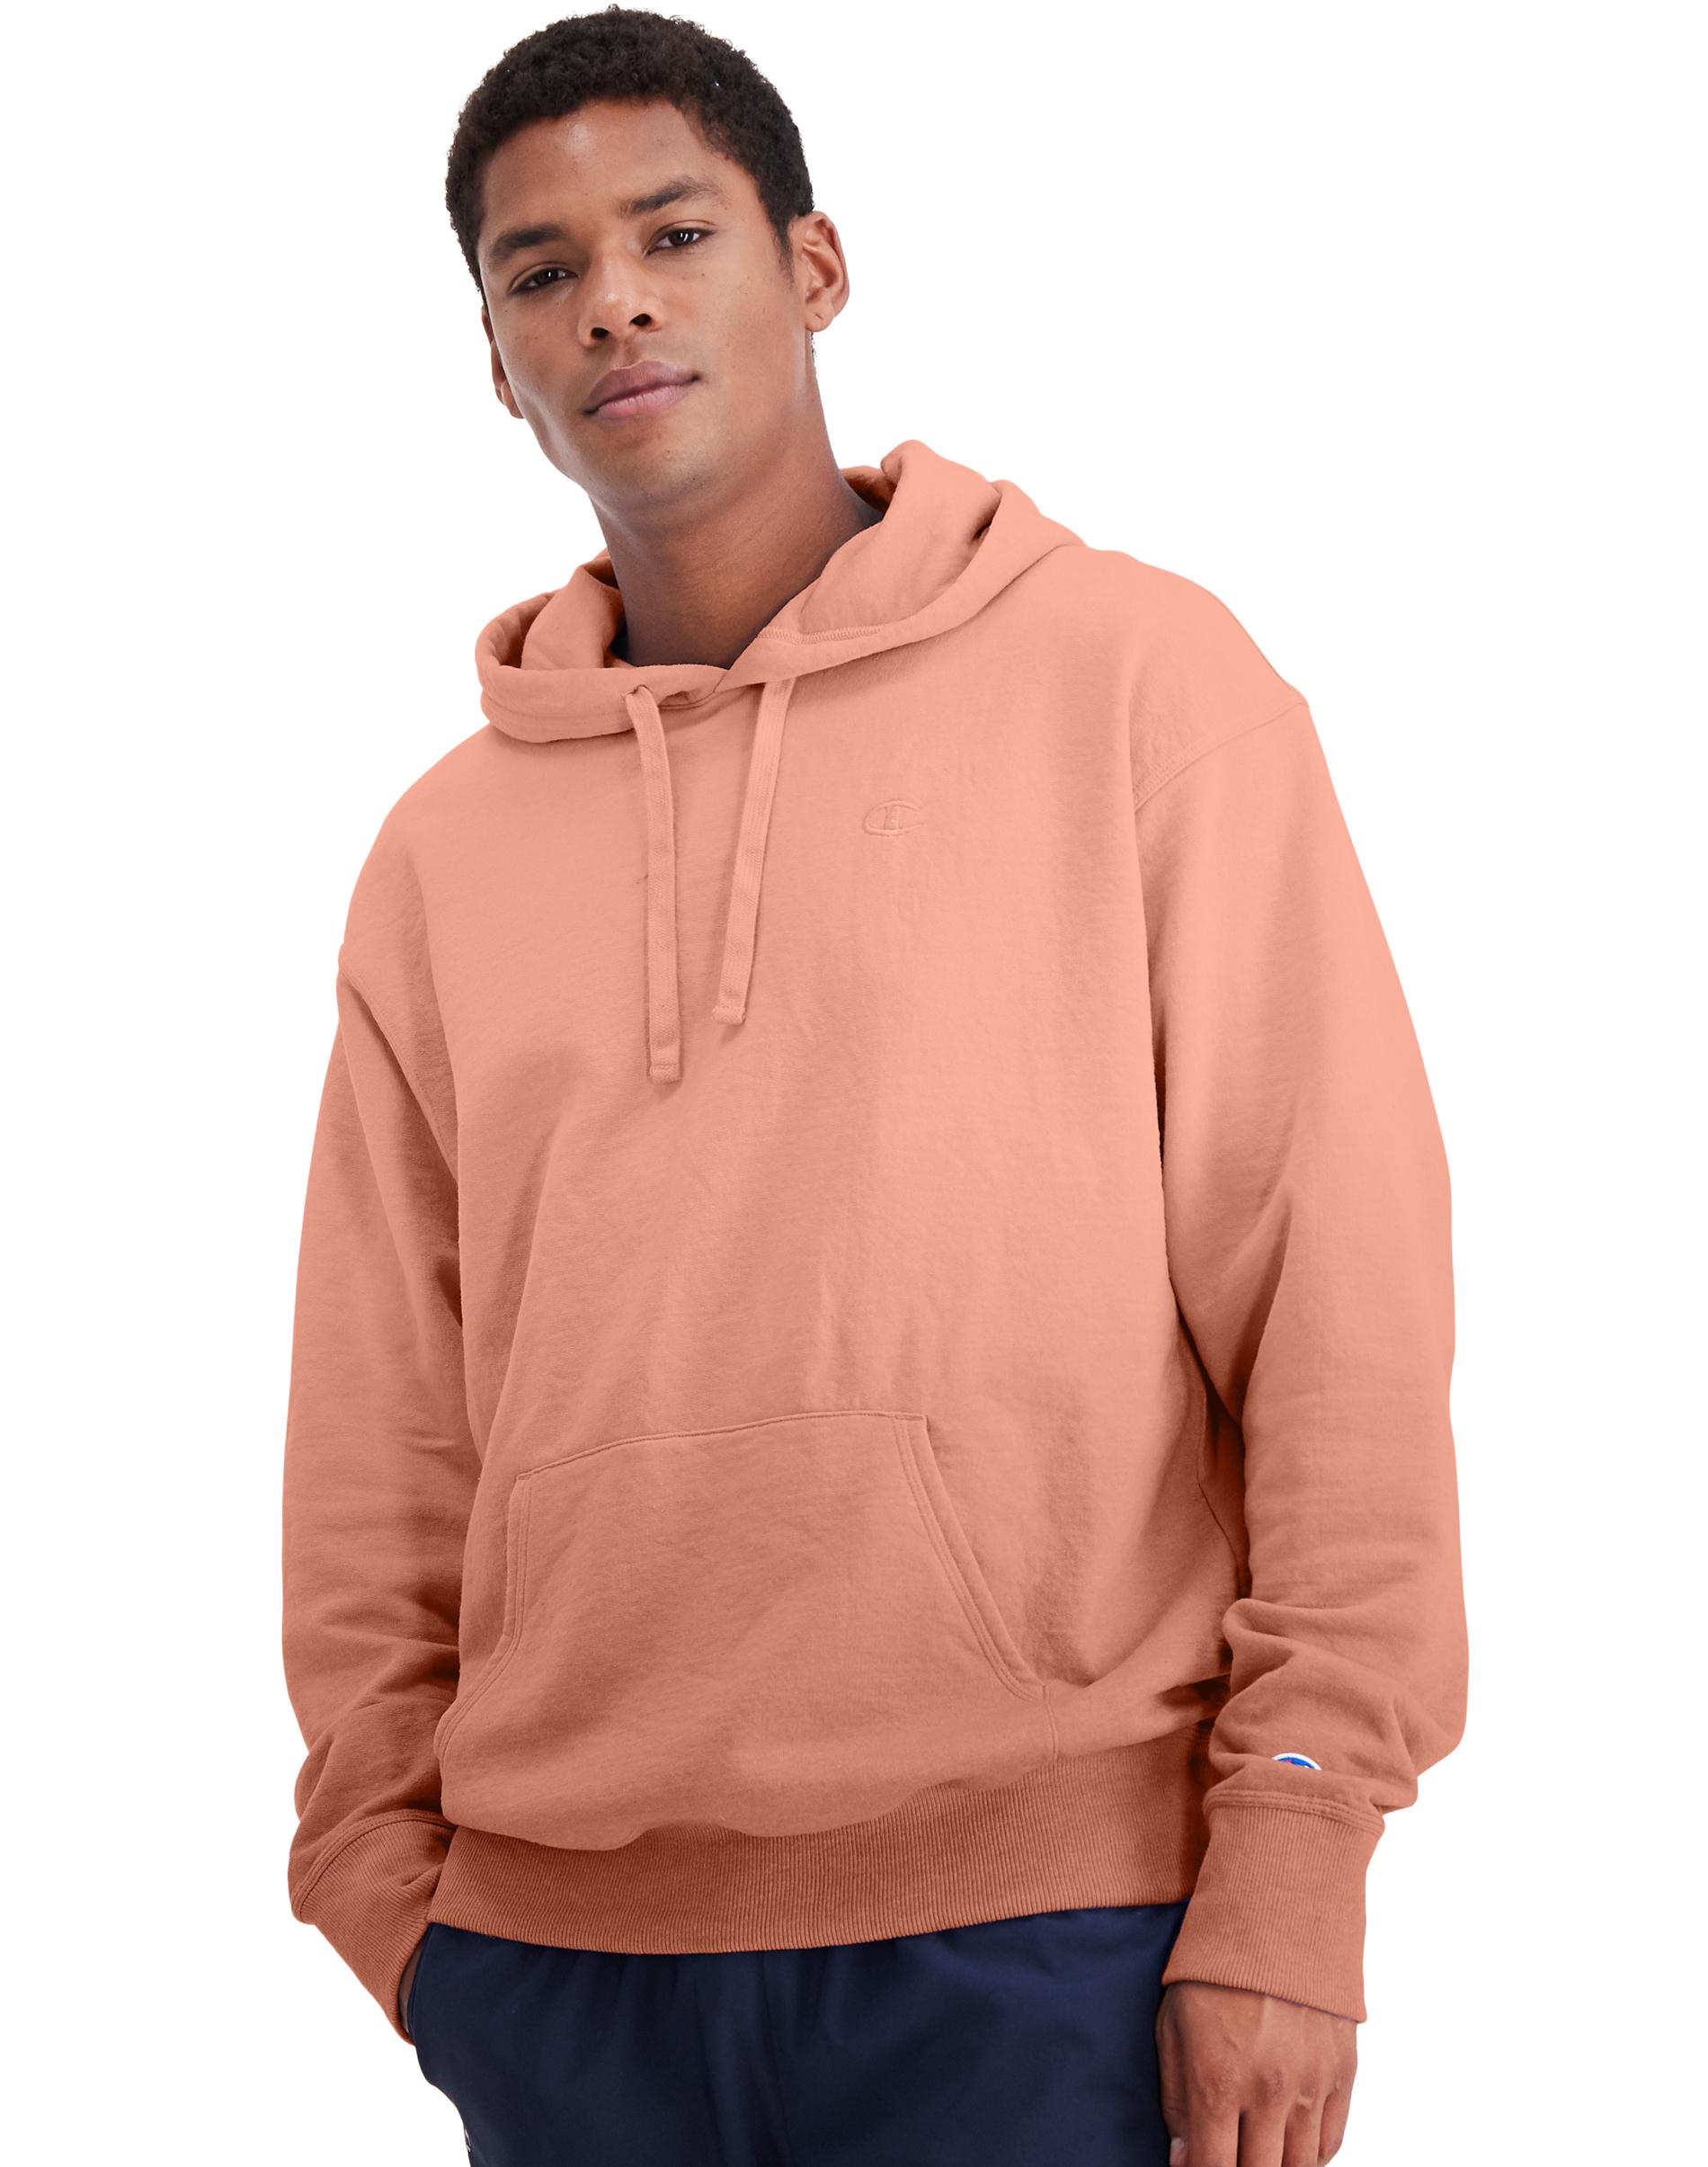 Men's Powerblend Ombre Hoodie, Orange, swatch